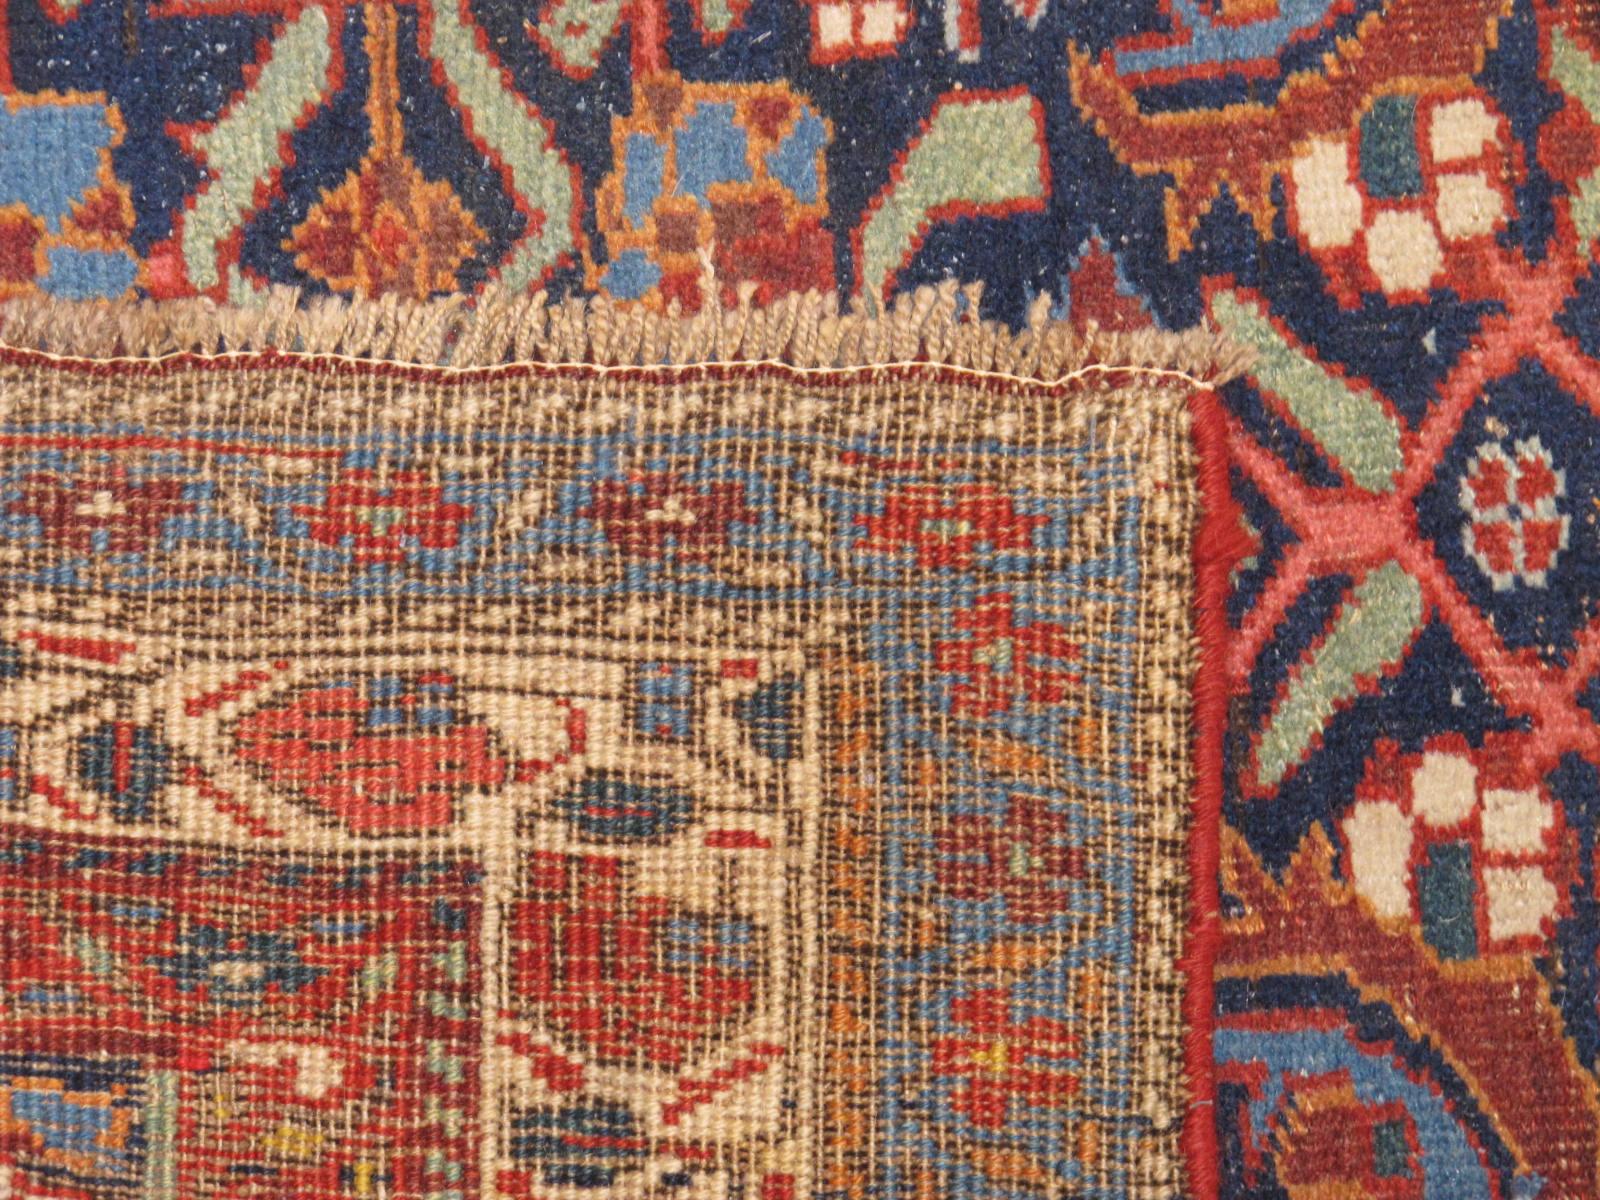 23182 antique persian bidjar runner 3,11 x 18,2 (3)